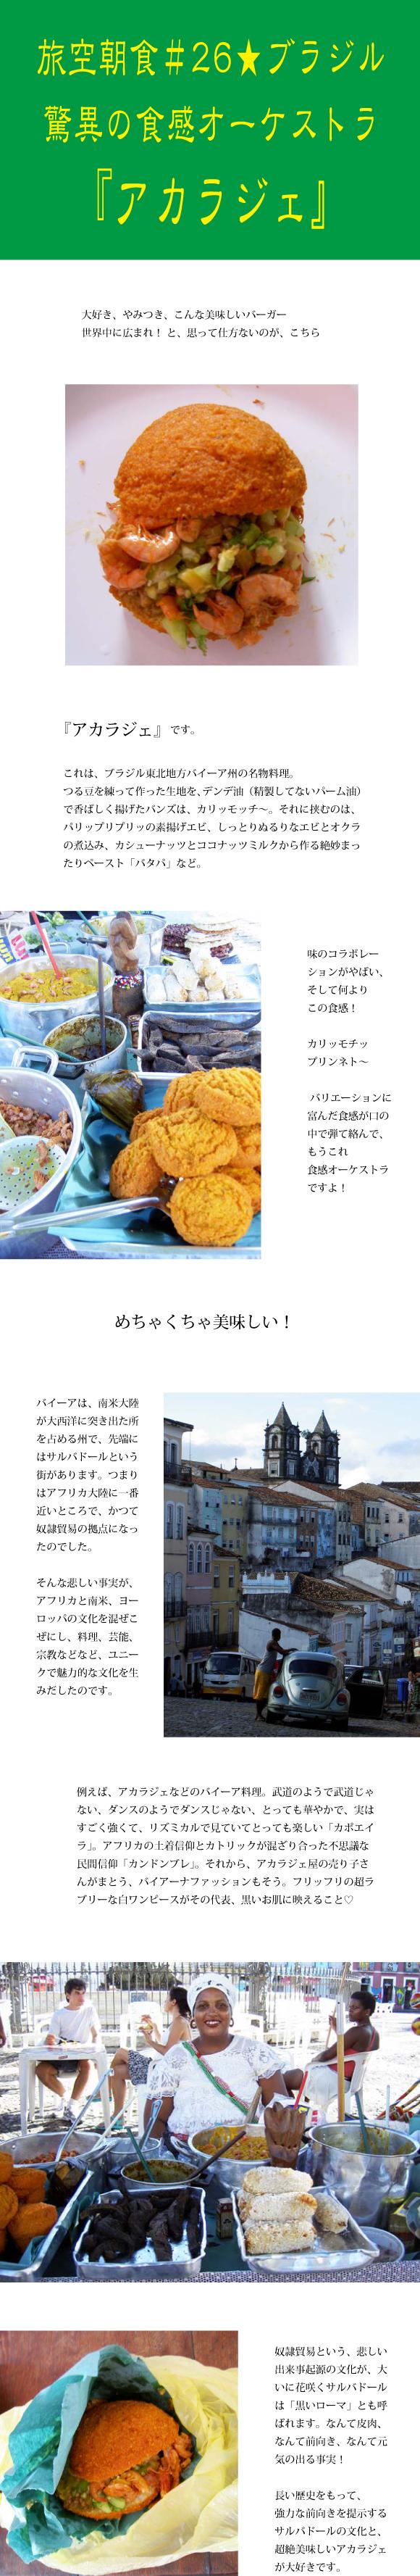 tomako170608.jpg